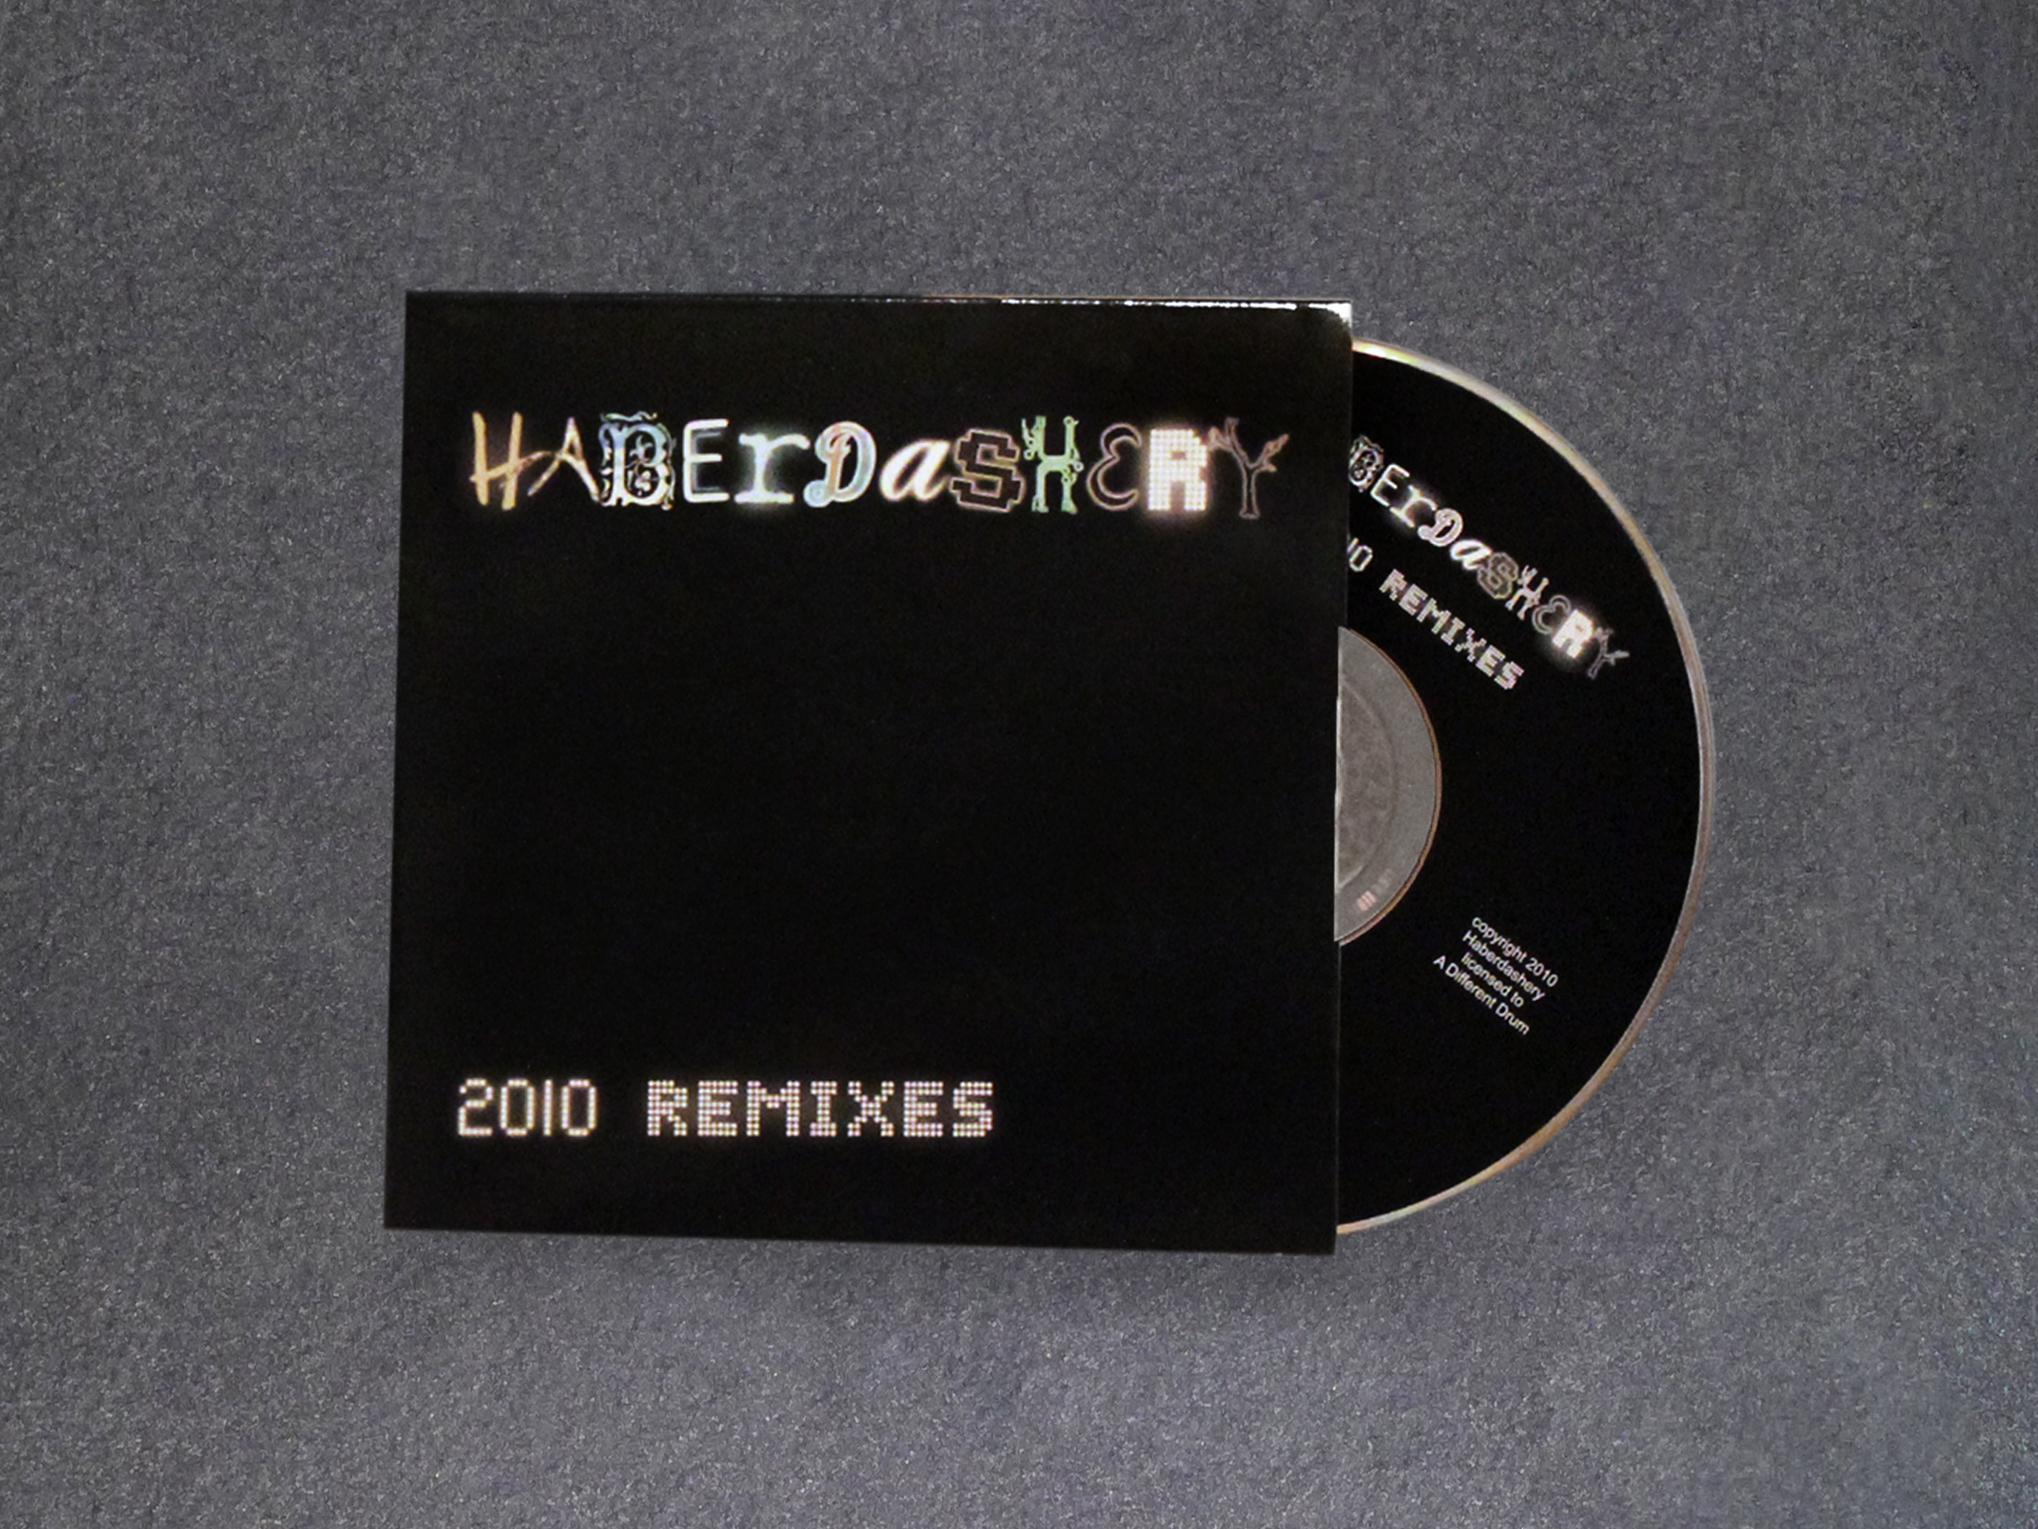 2010 Remixes CD.jpg